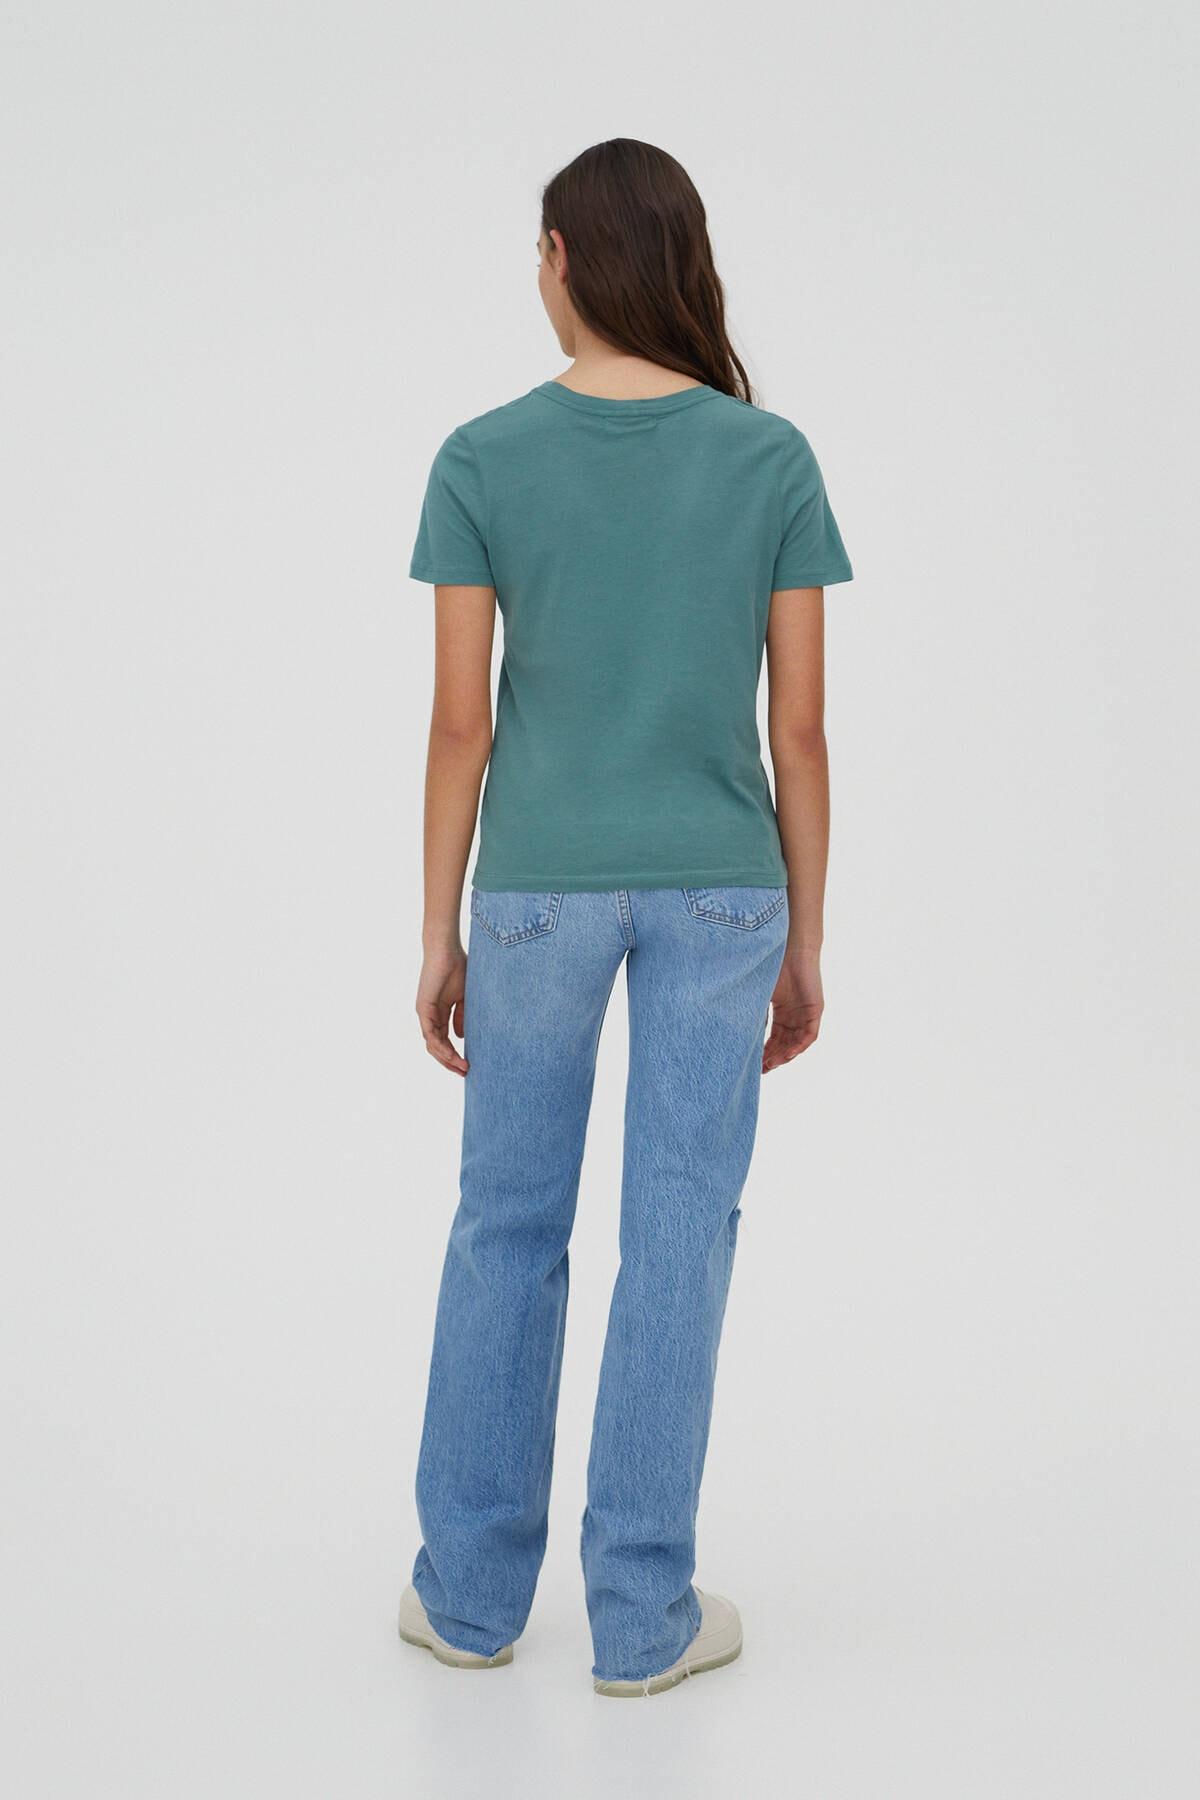 Pull & Bear Kadın Yeşil Basic Bisiklet Yaka T-Shirt 05244357 2